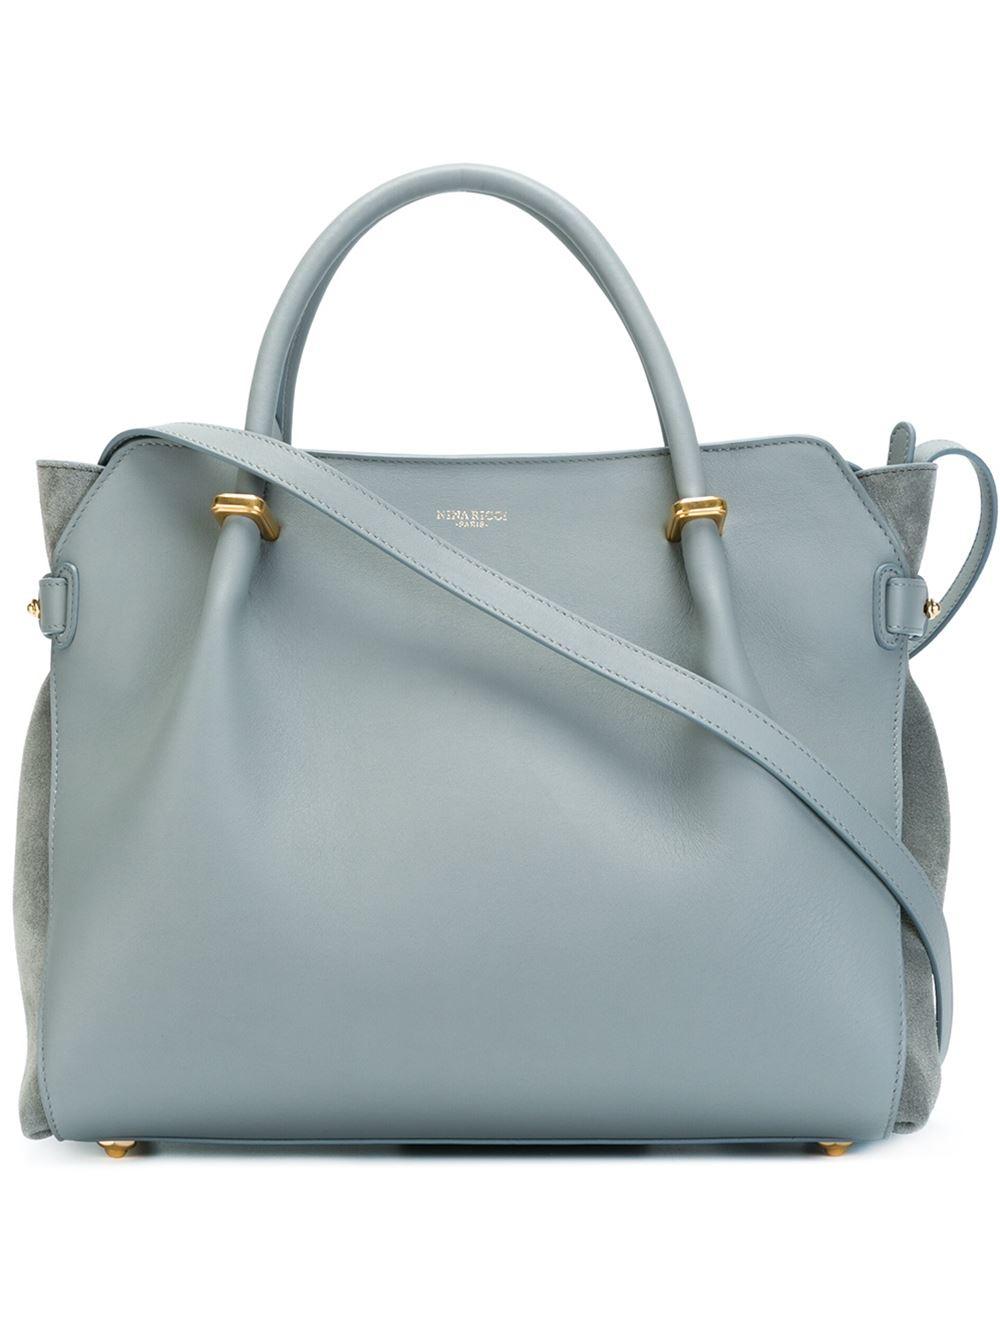 fb7ddb102f Nina Ricci  marché  Tote Bag in Blue - Lyst